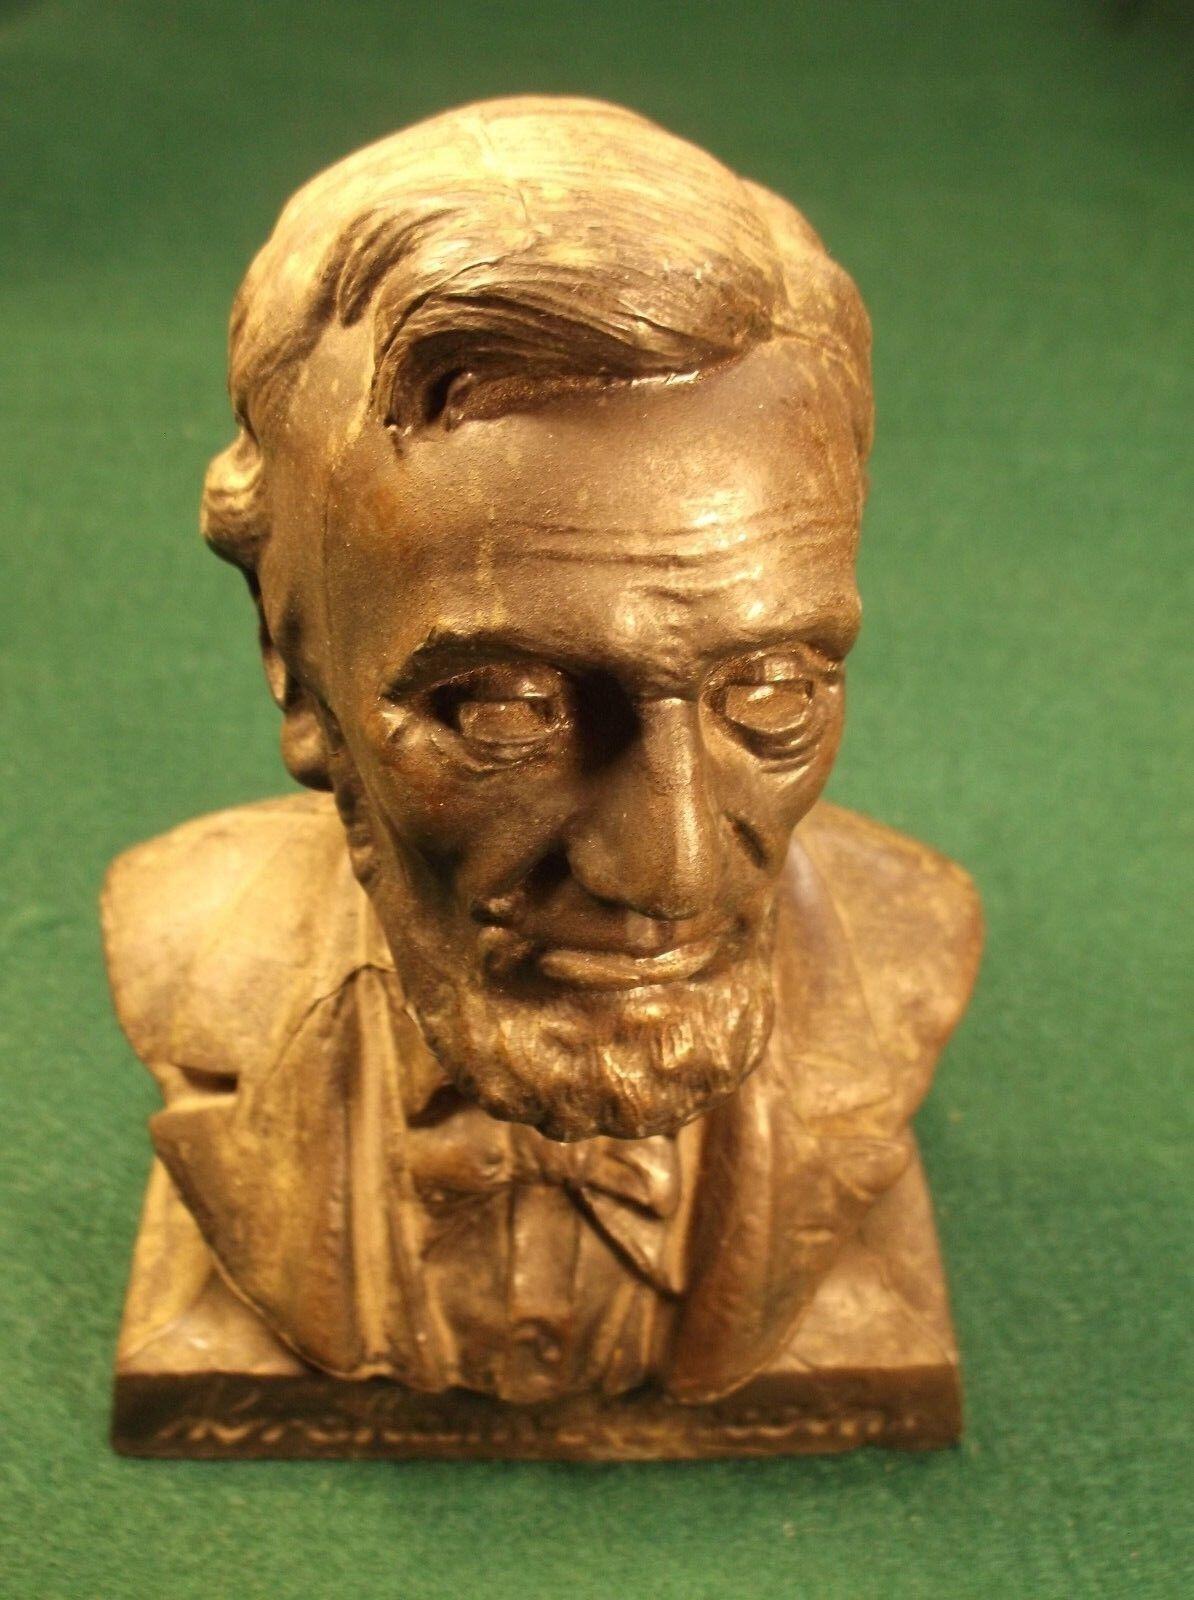 #2 of 2, HEAVY OLD VTG ANTIQUE ABE ABRAHAM LINCOLN COIN BANK, KIMBALLTON, IOWA